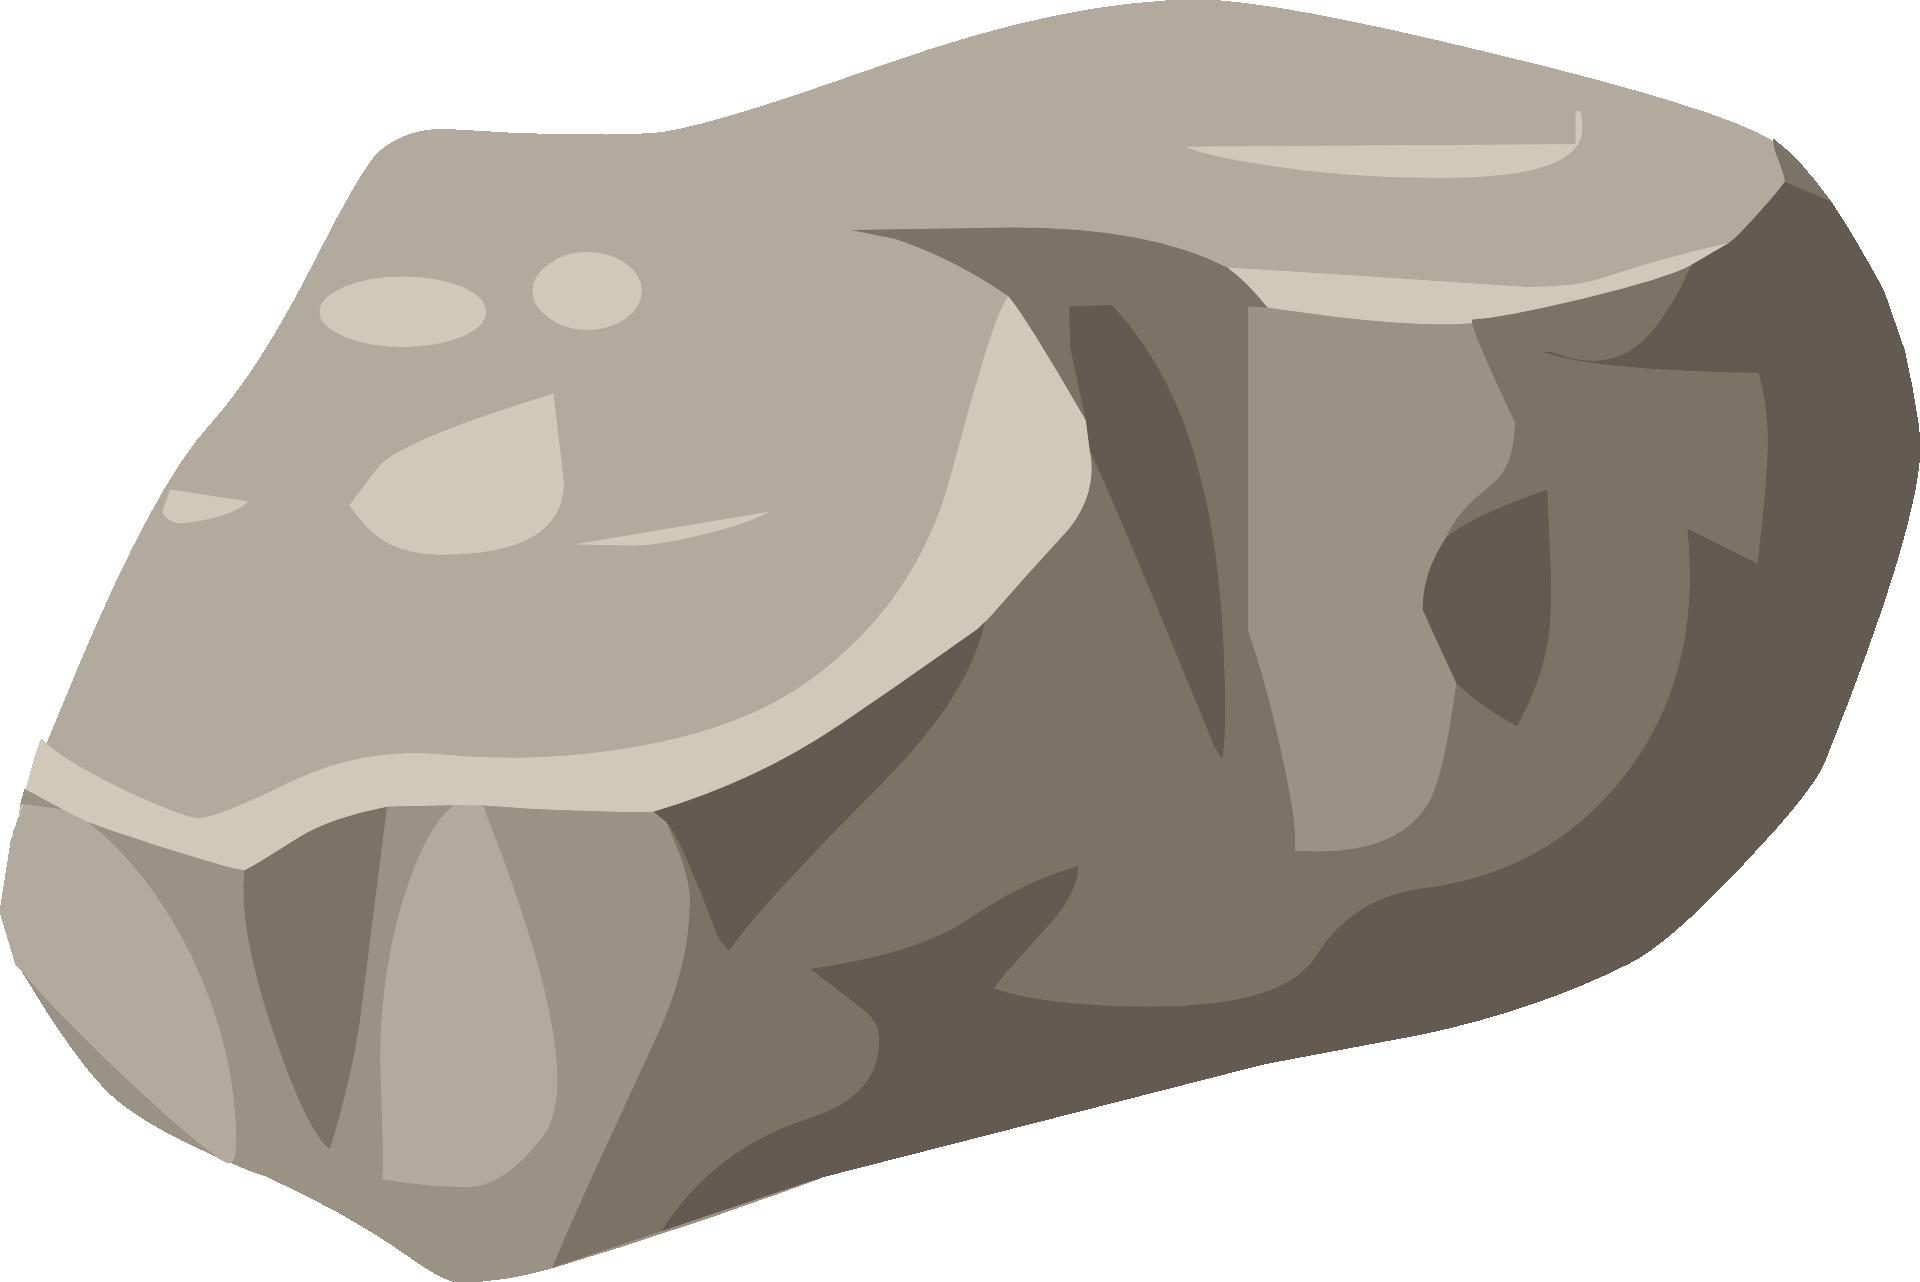 Boulder clipart round stone. Rock nature granite template